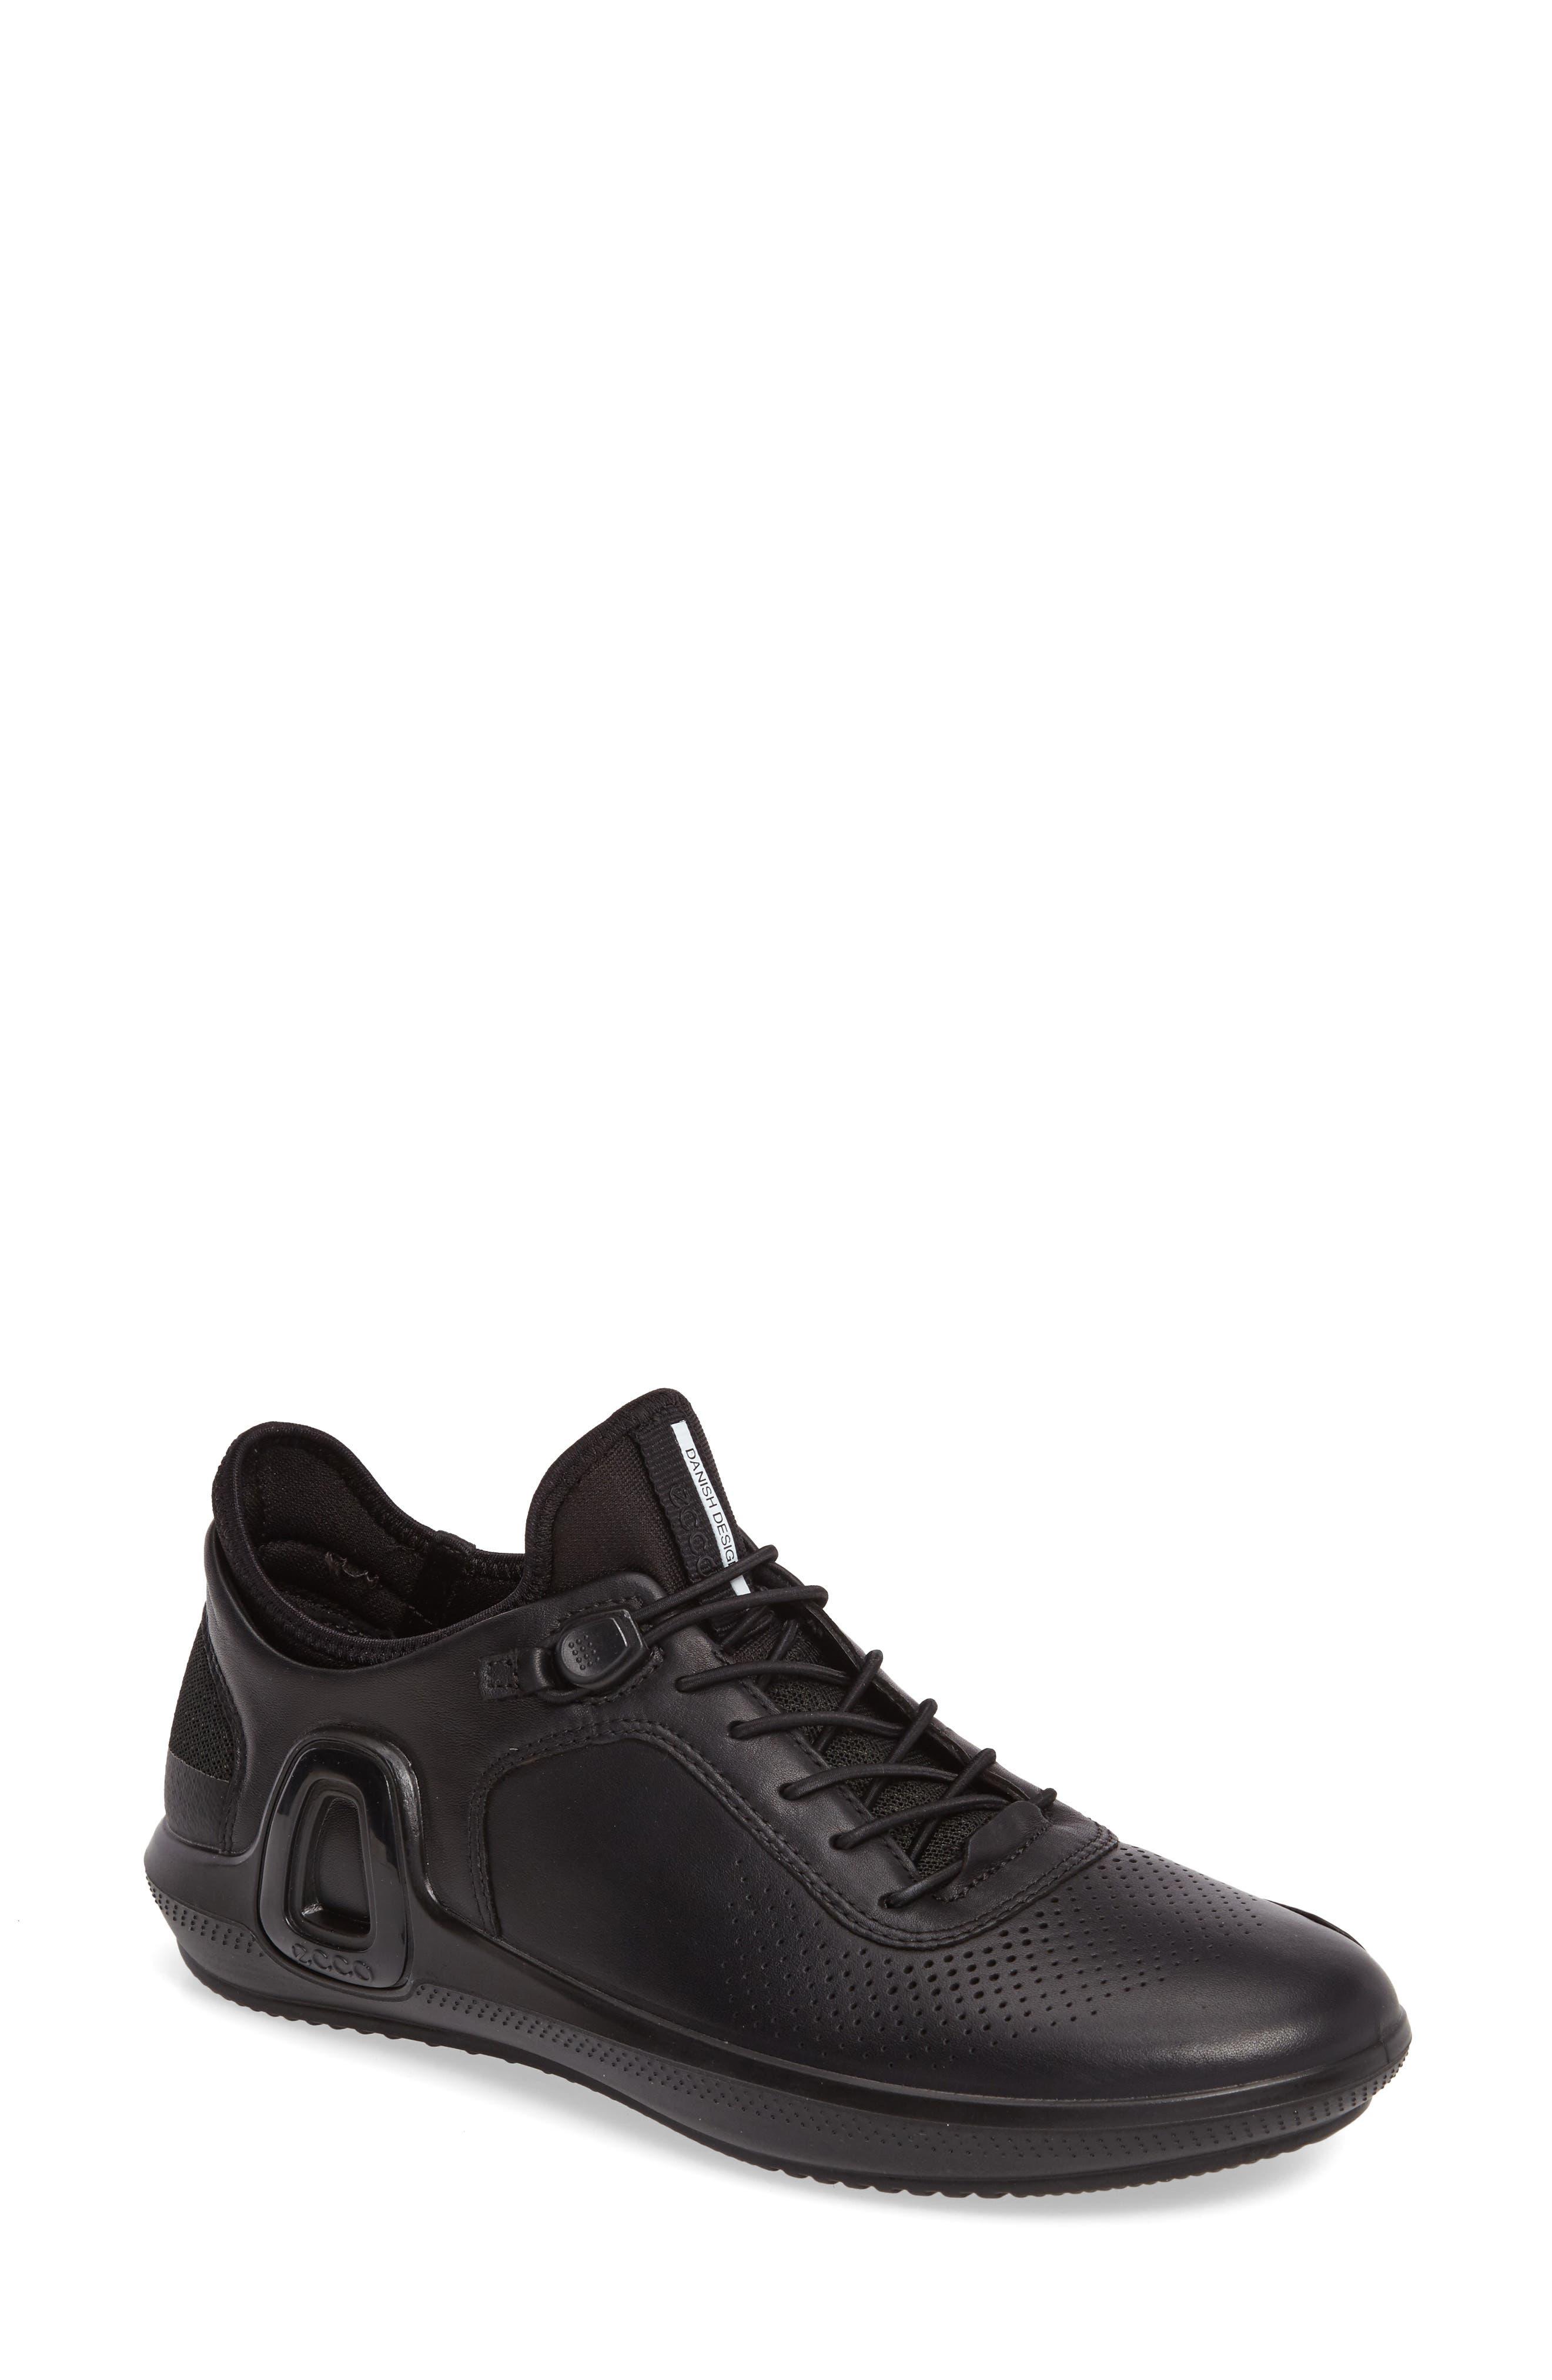 Main Image - ECCO Intrinsic 3 Sneaker (Women)